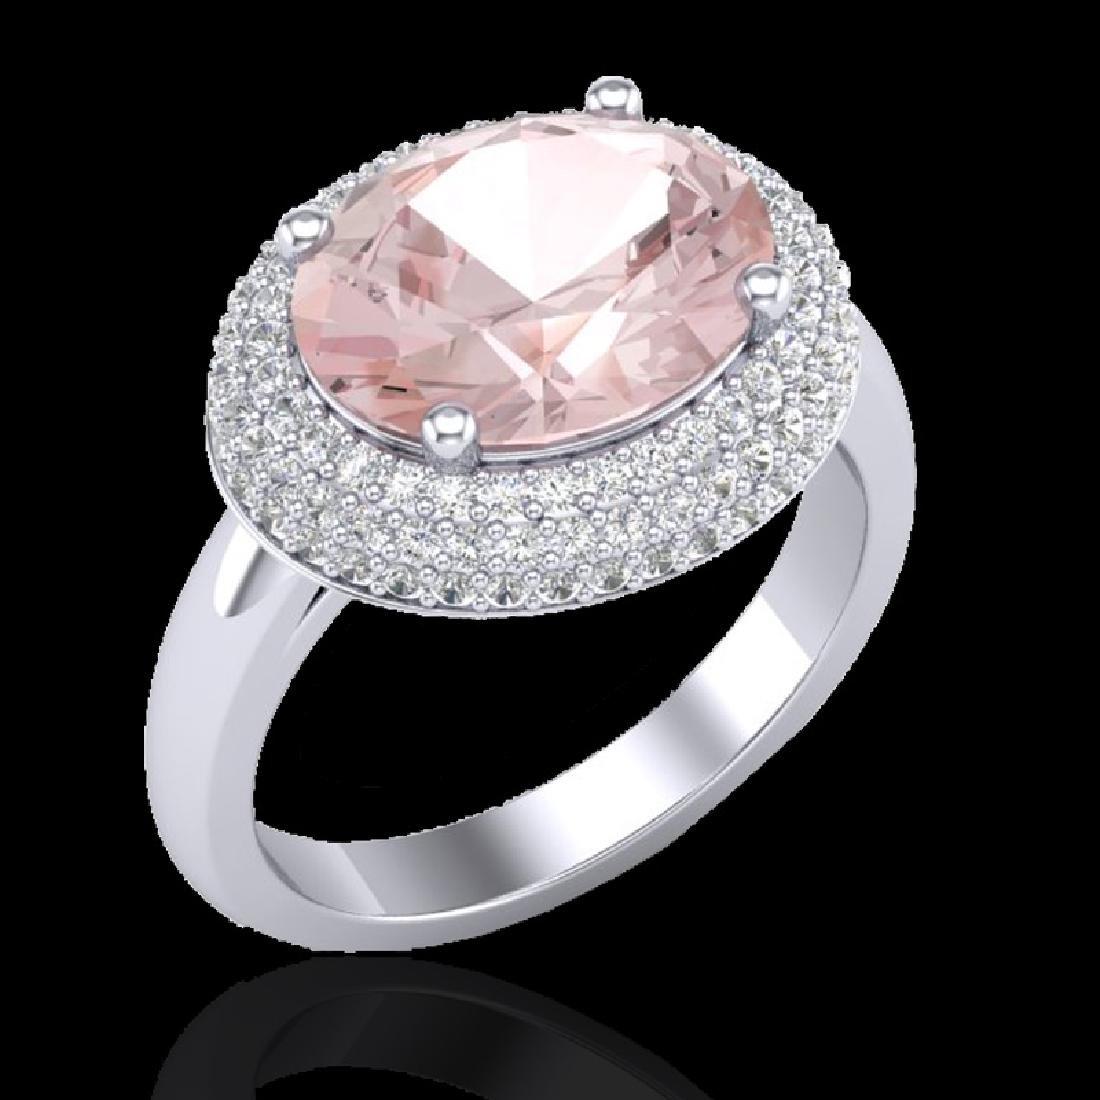 4.50 CTW Morganite & Micro Pave VS/SI Diamond Ring 18K